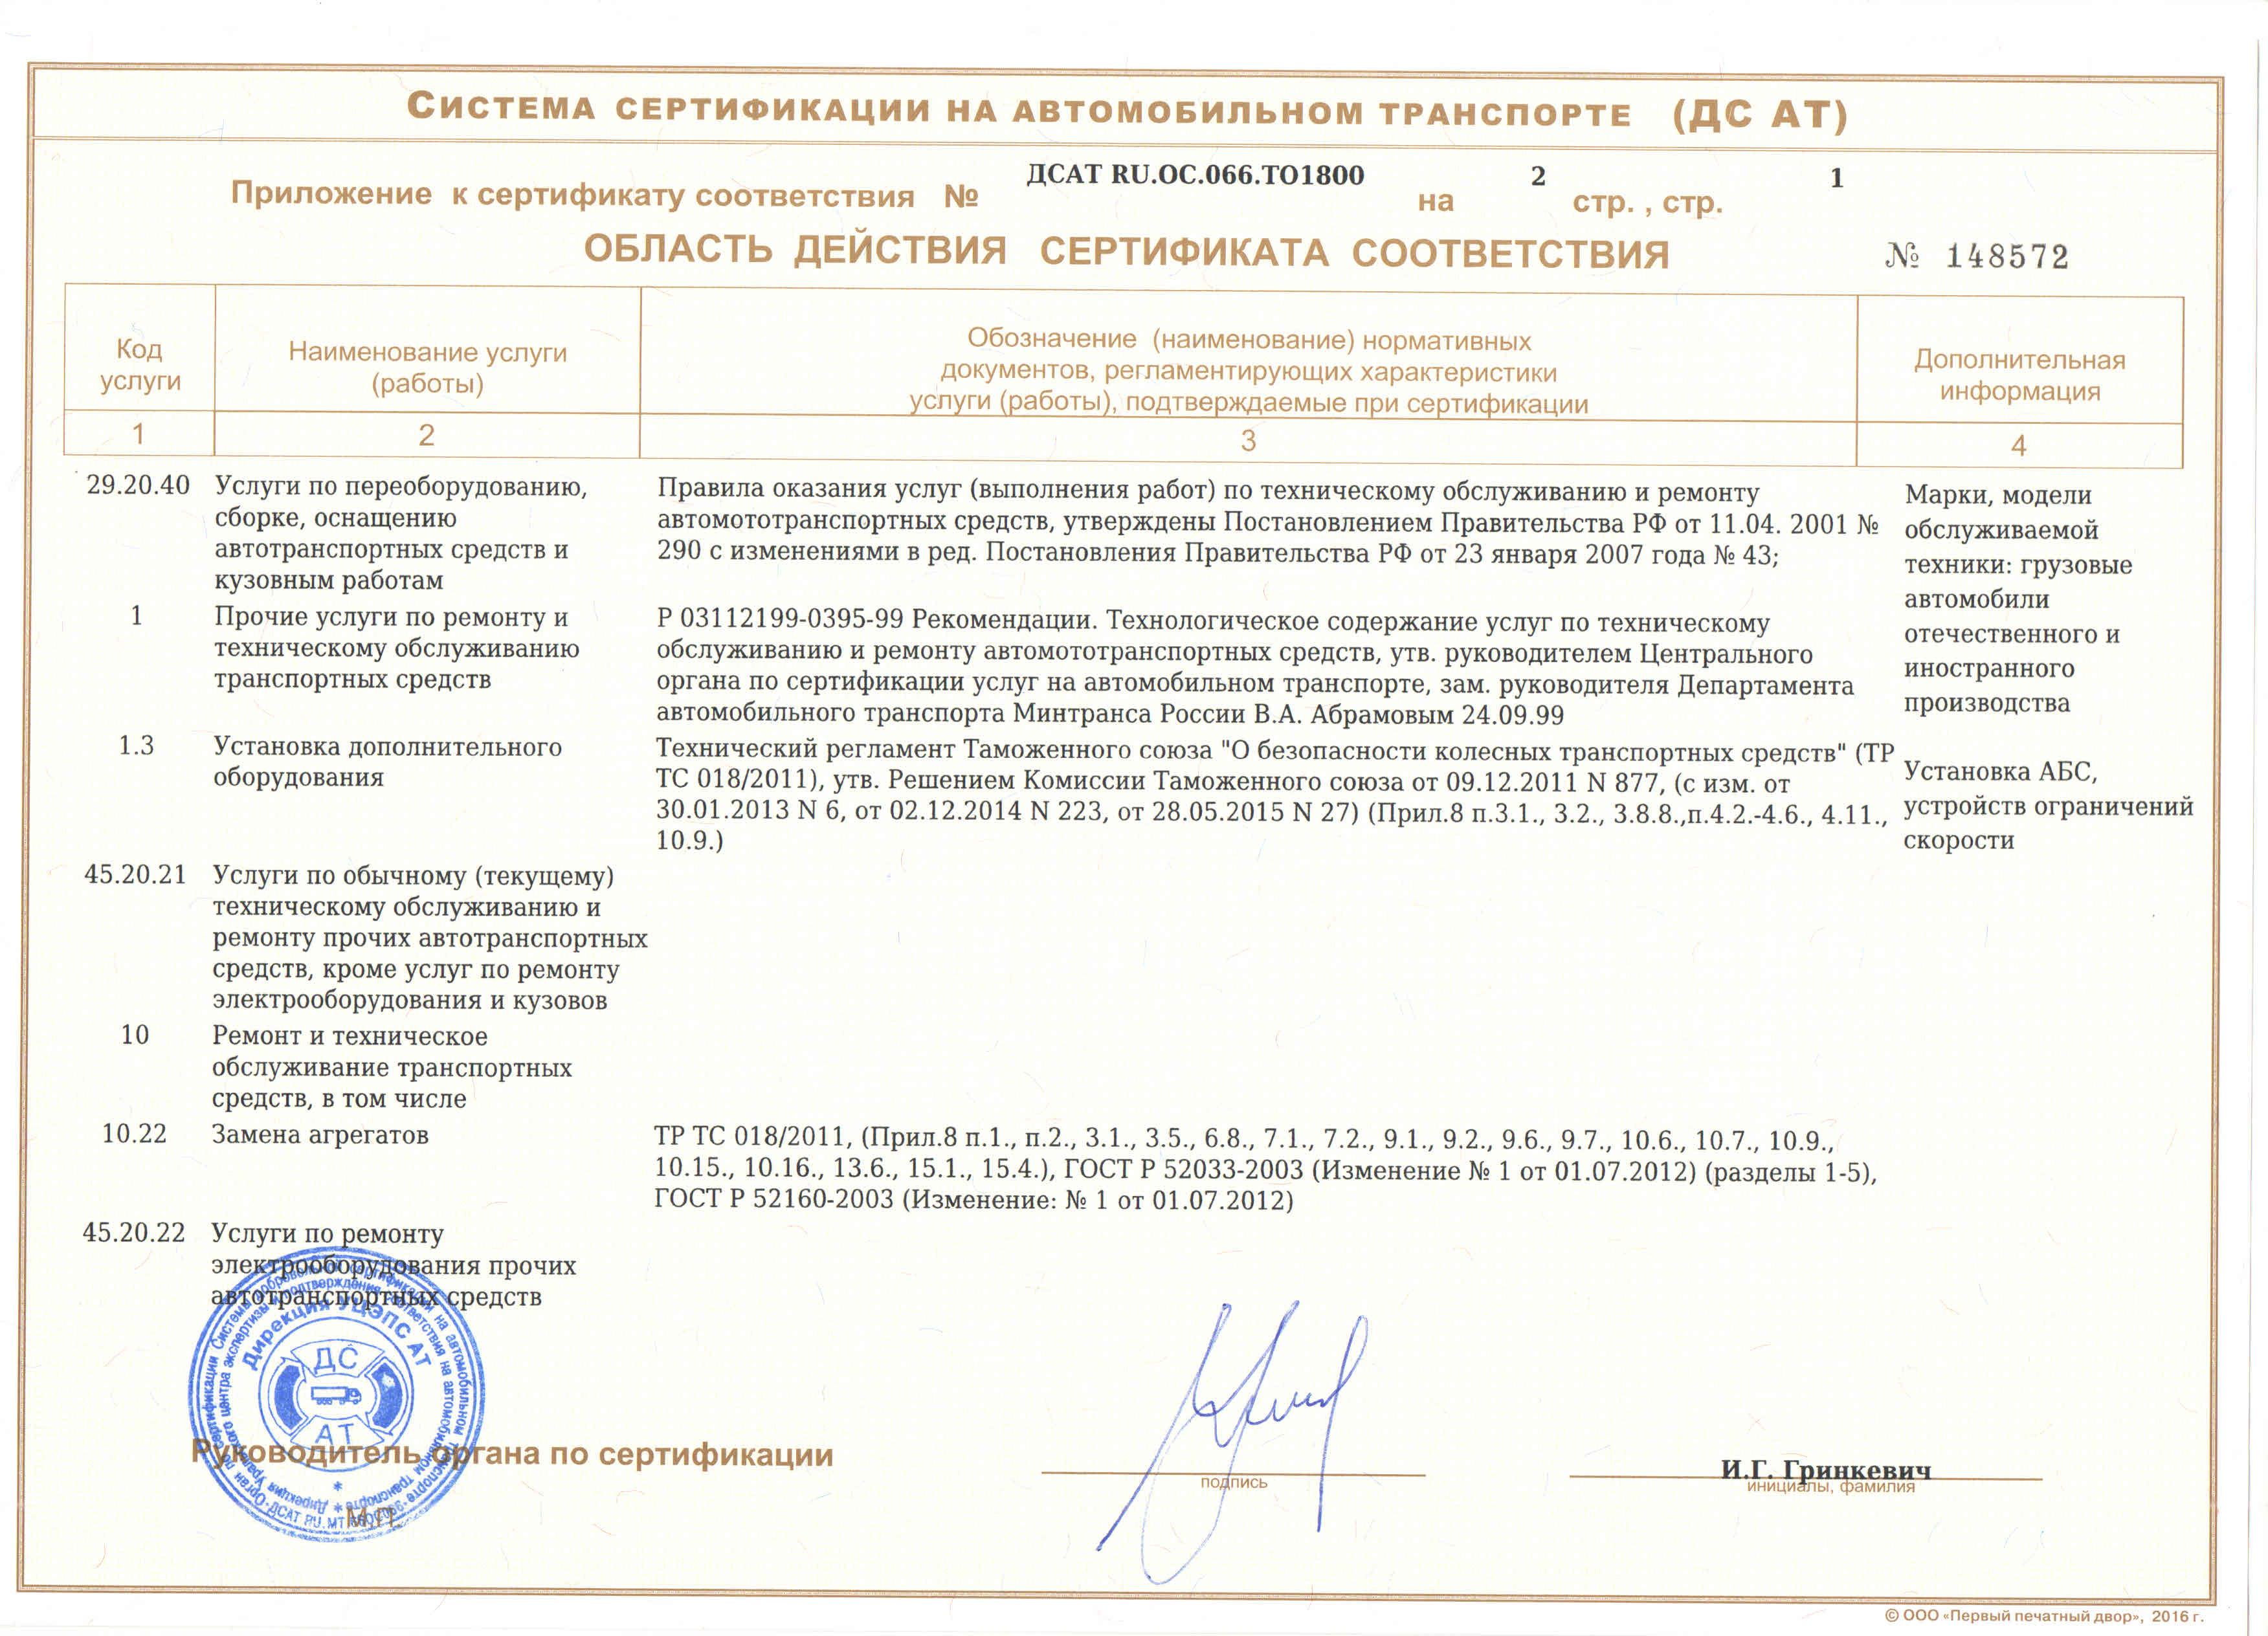 prilozhenie-k-sertifikatu